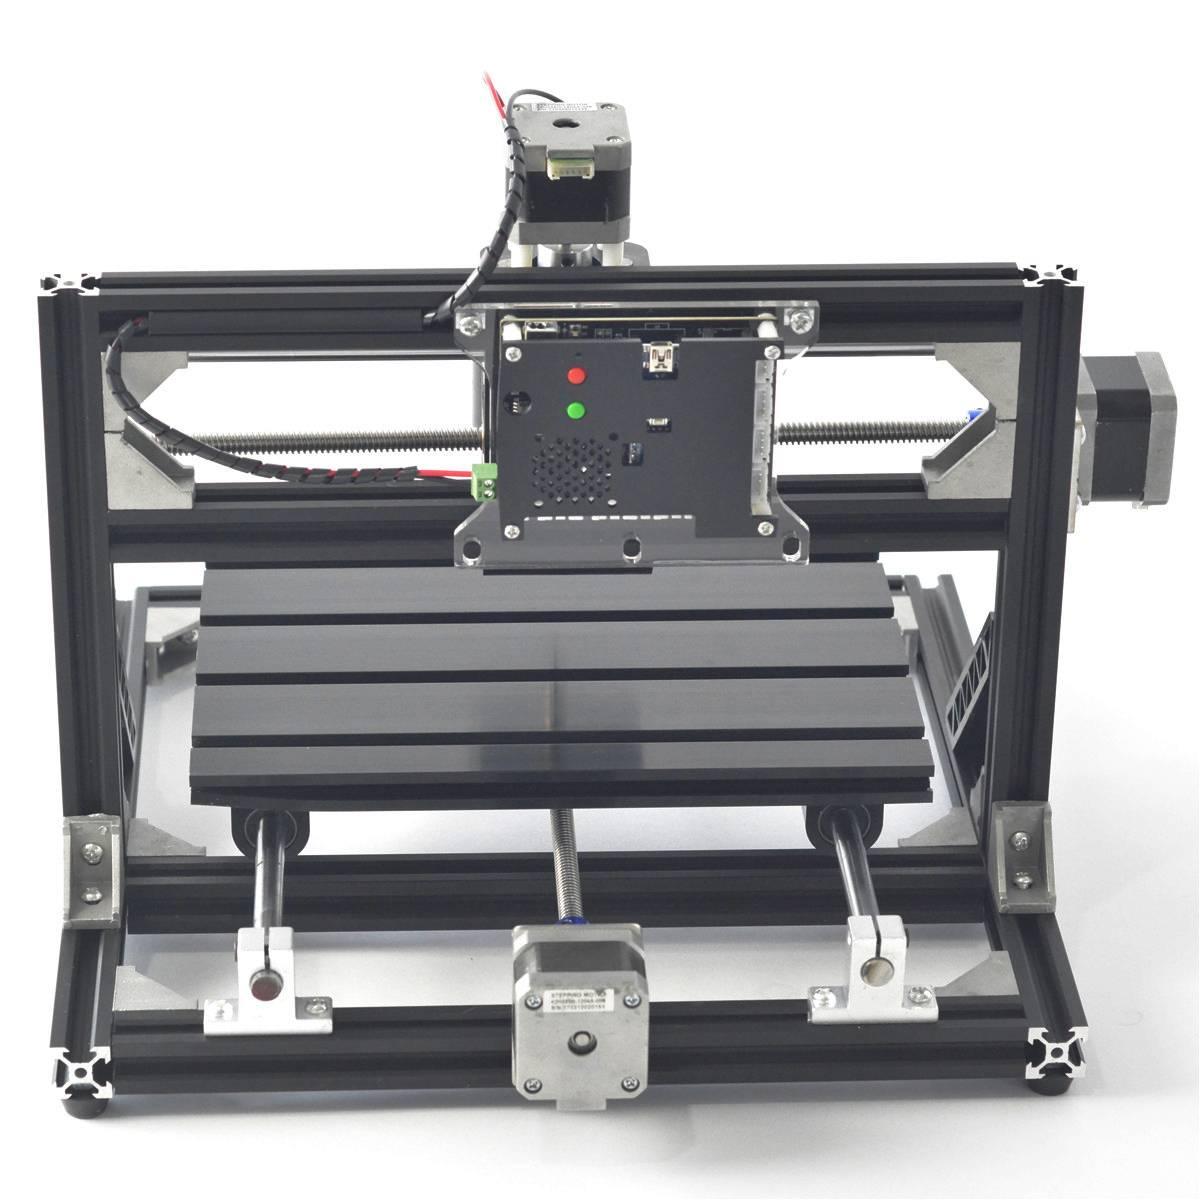 2500mw CNC3018 diy mini cnc engraving machine,laser engraving,Pcb PVC Milling Machine,wood router,cnc 3018,best Advanced toys2500mw CNC3018 diy mini cnc engraving machine,laser engraving,Pcb PVC Milling Machine,wood router,cnc 3018,best Advanced toys